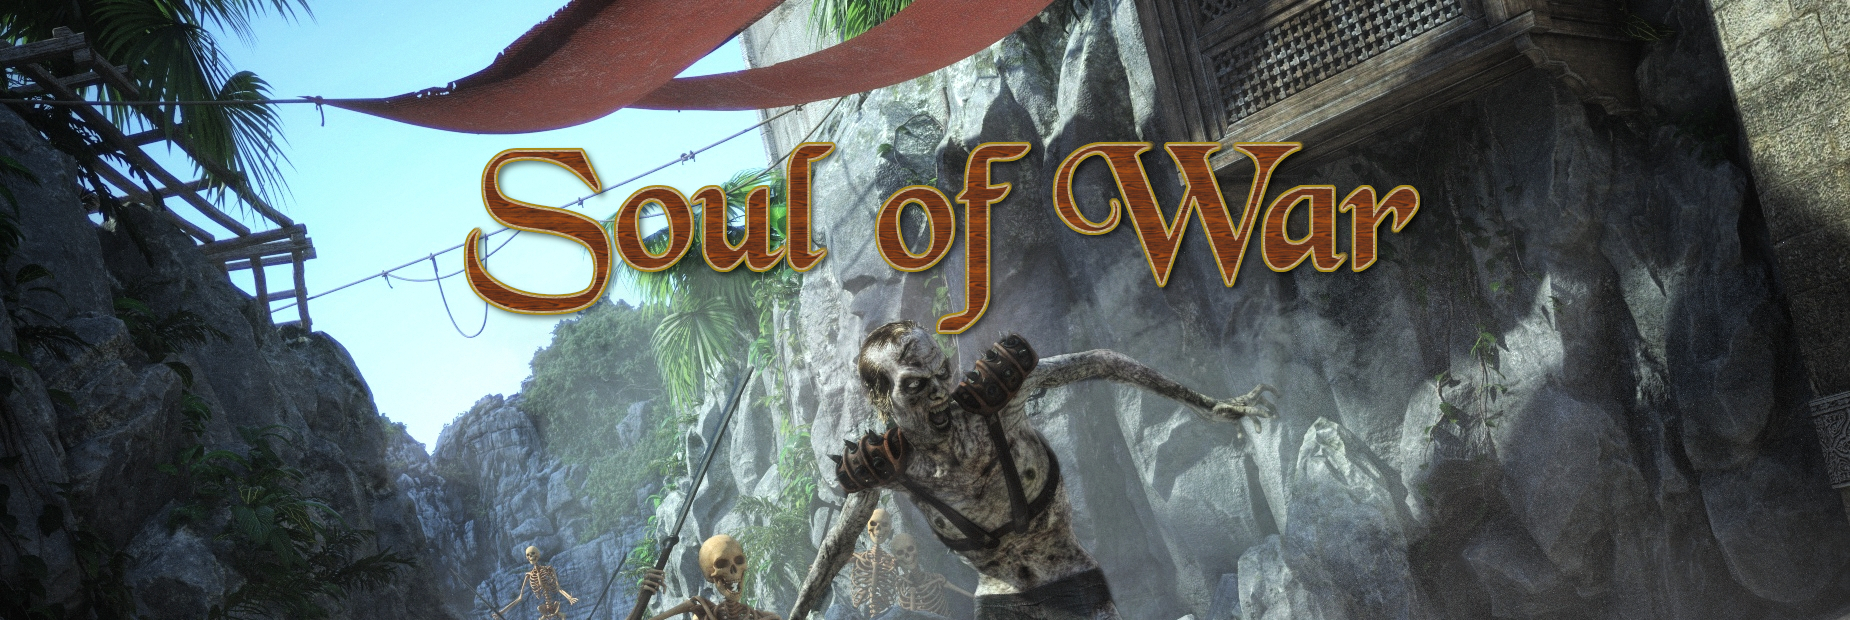 Soul of War-D&D inspired RPG video game